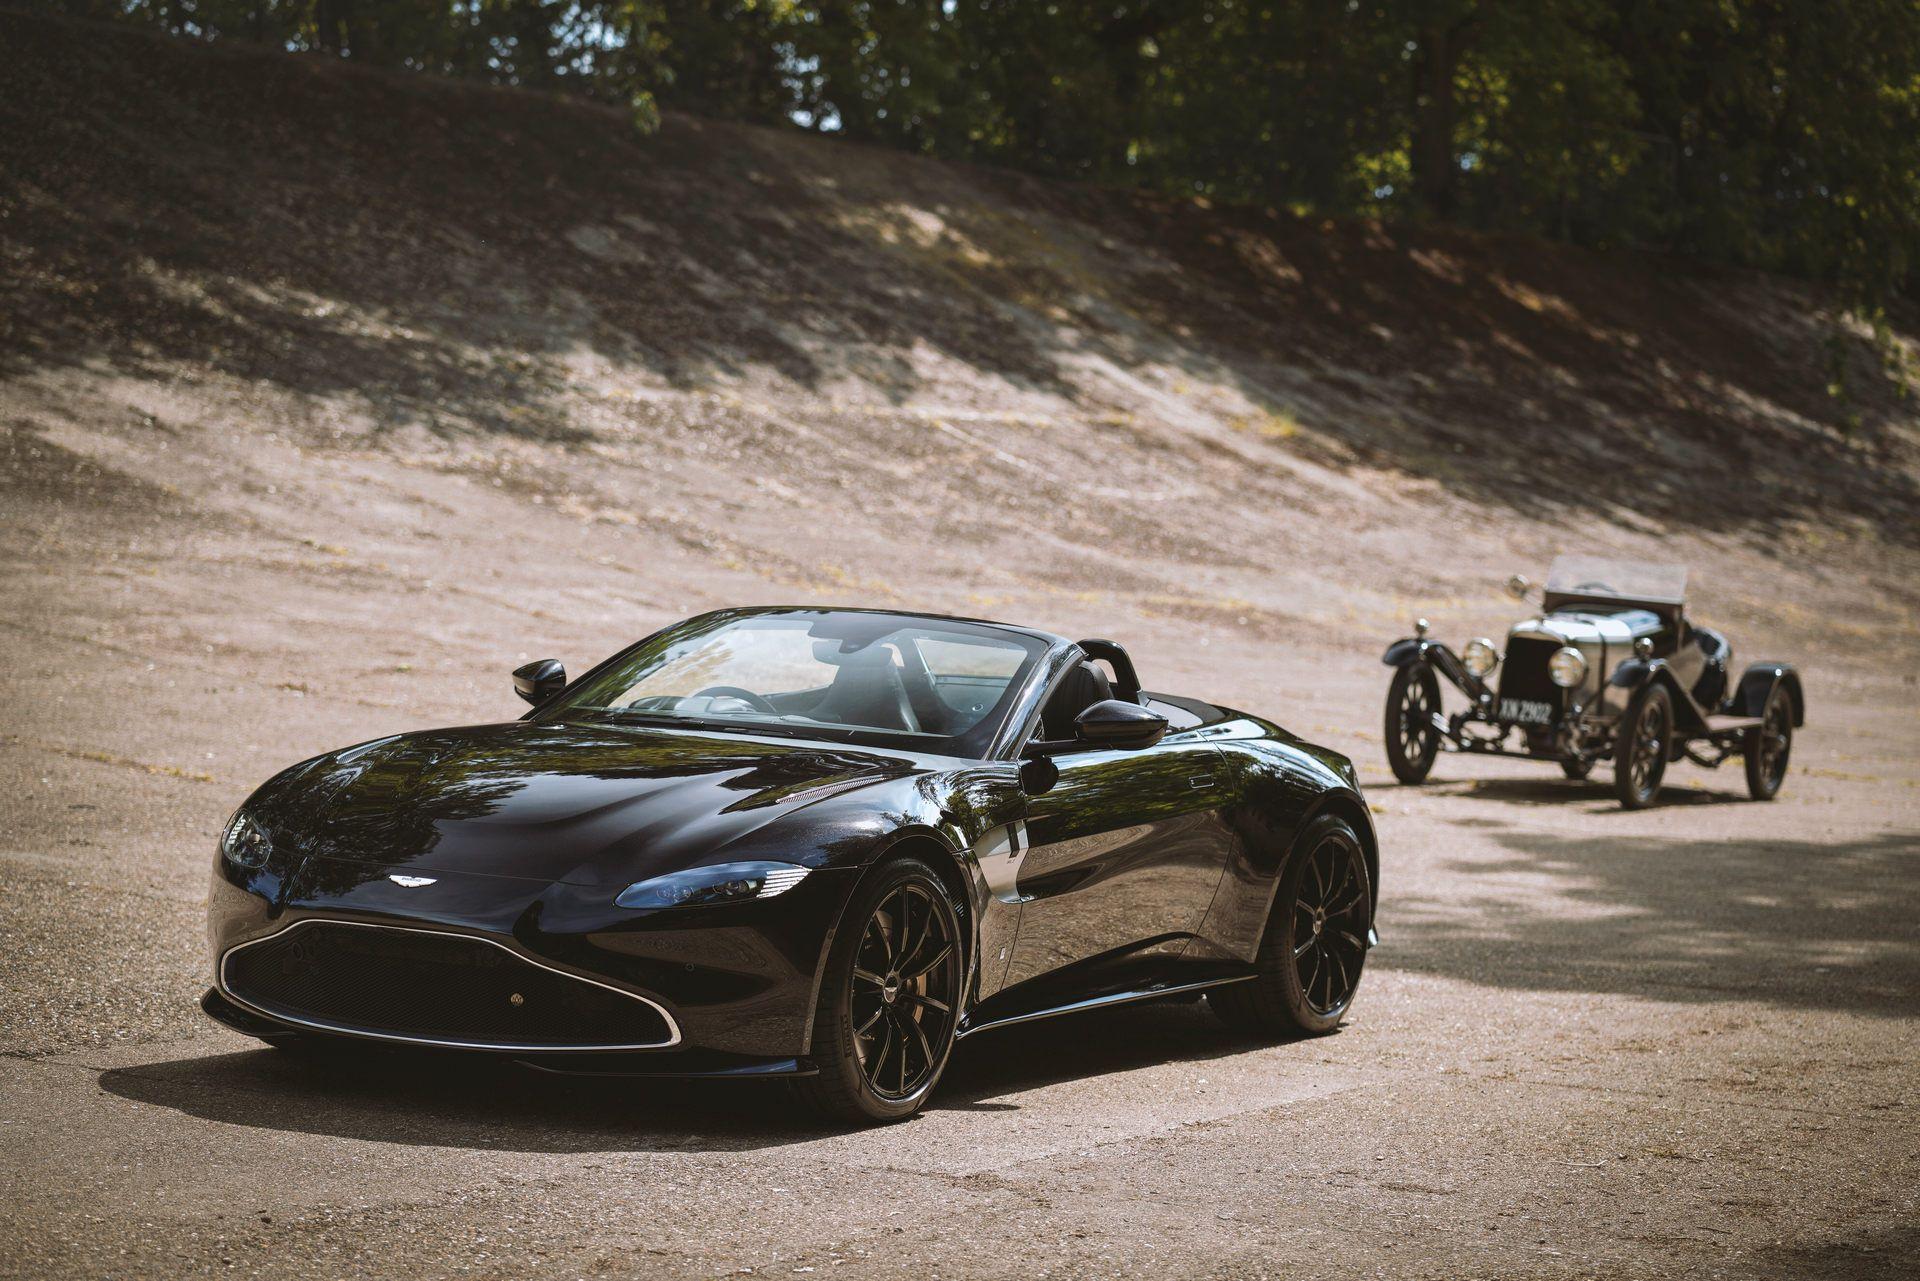 Aston-Martin-Vantage-Roadster-A3-2